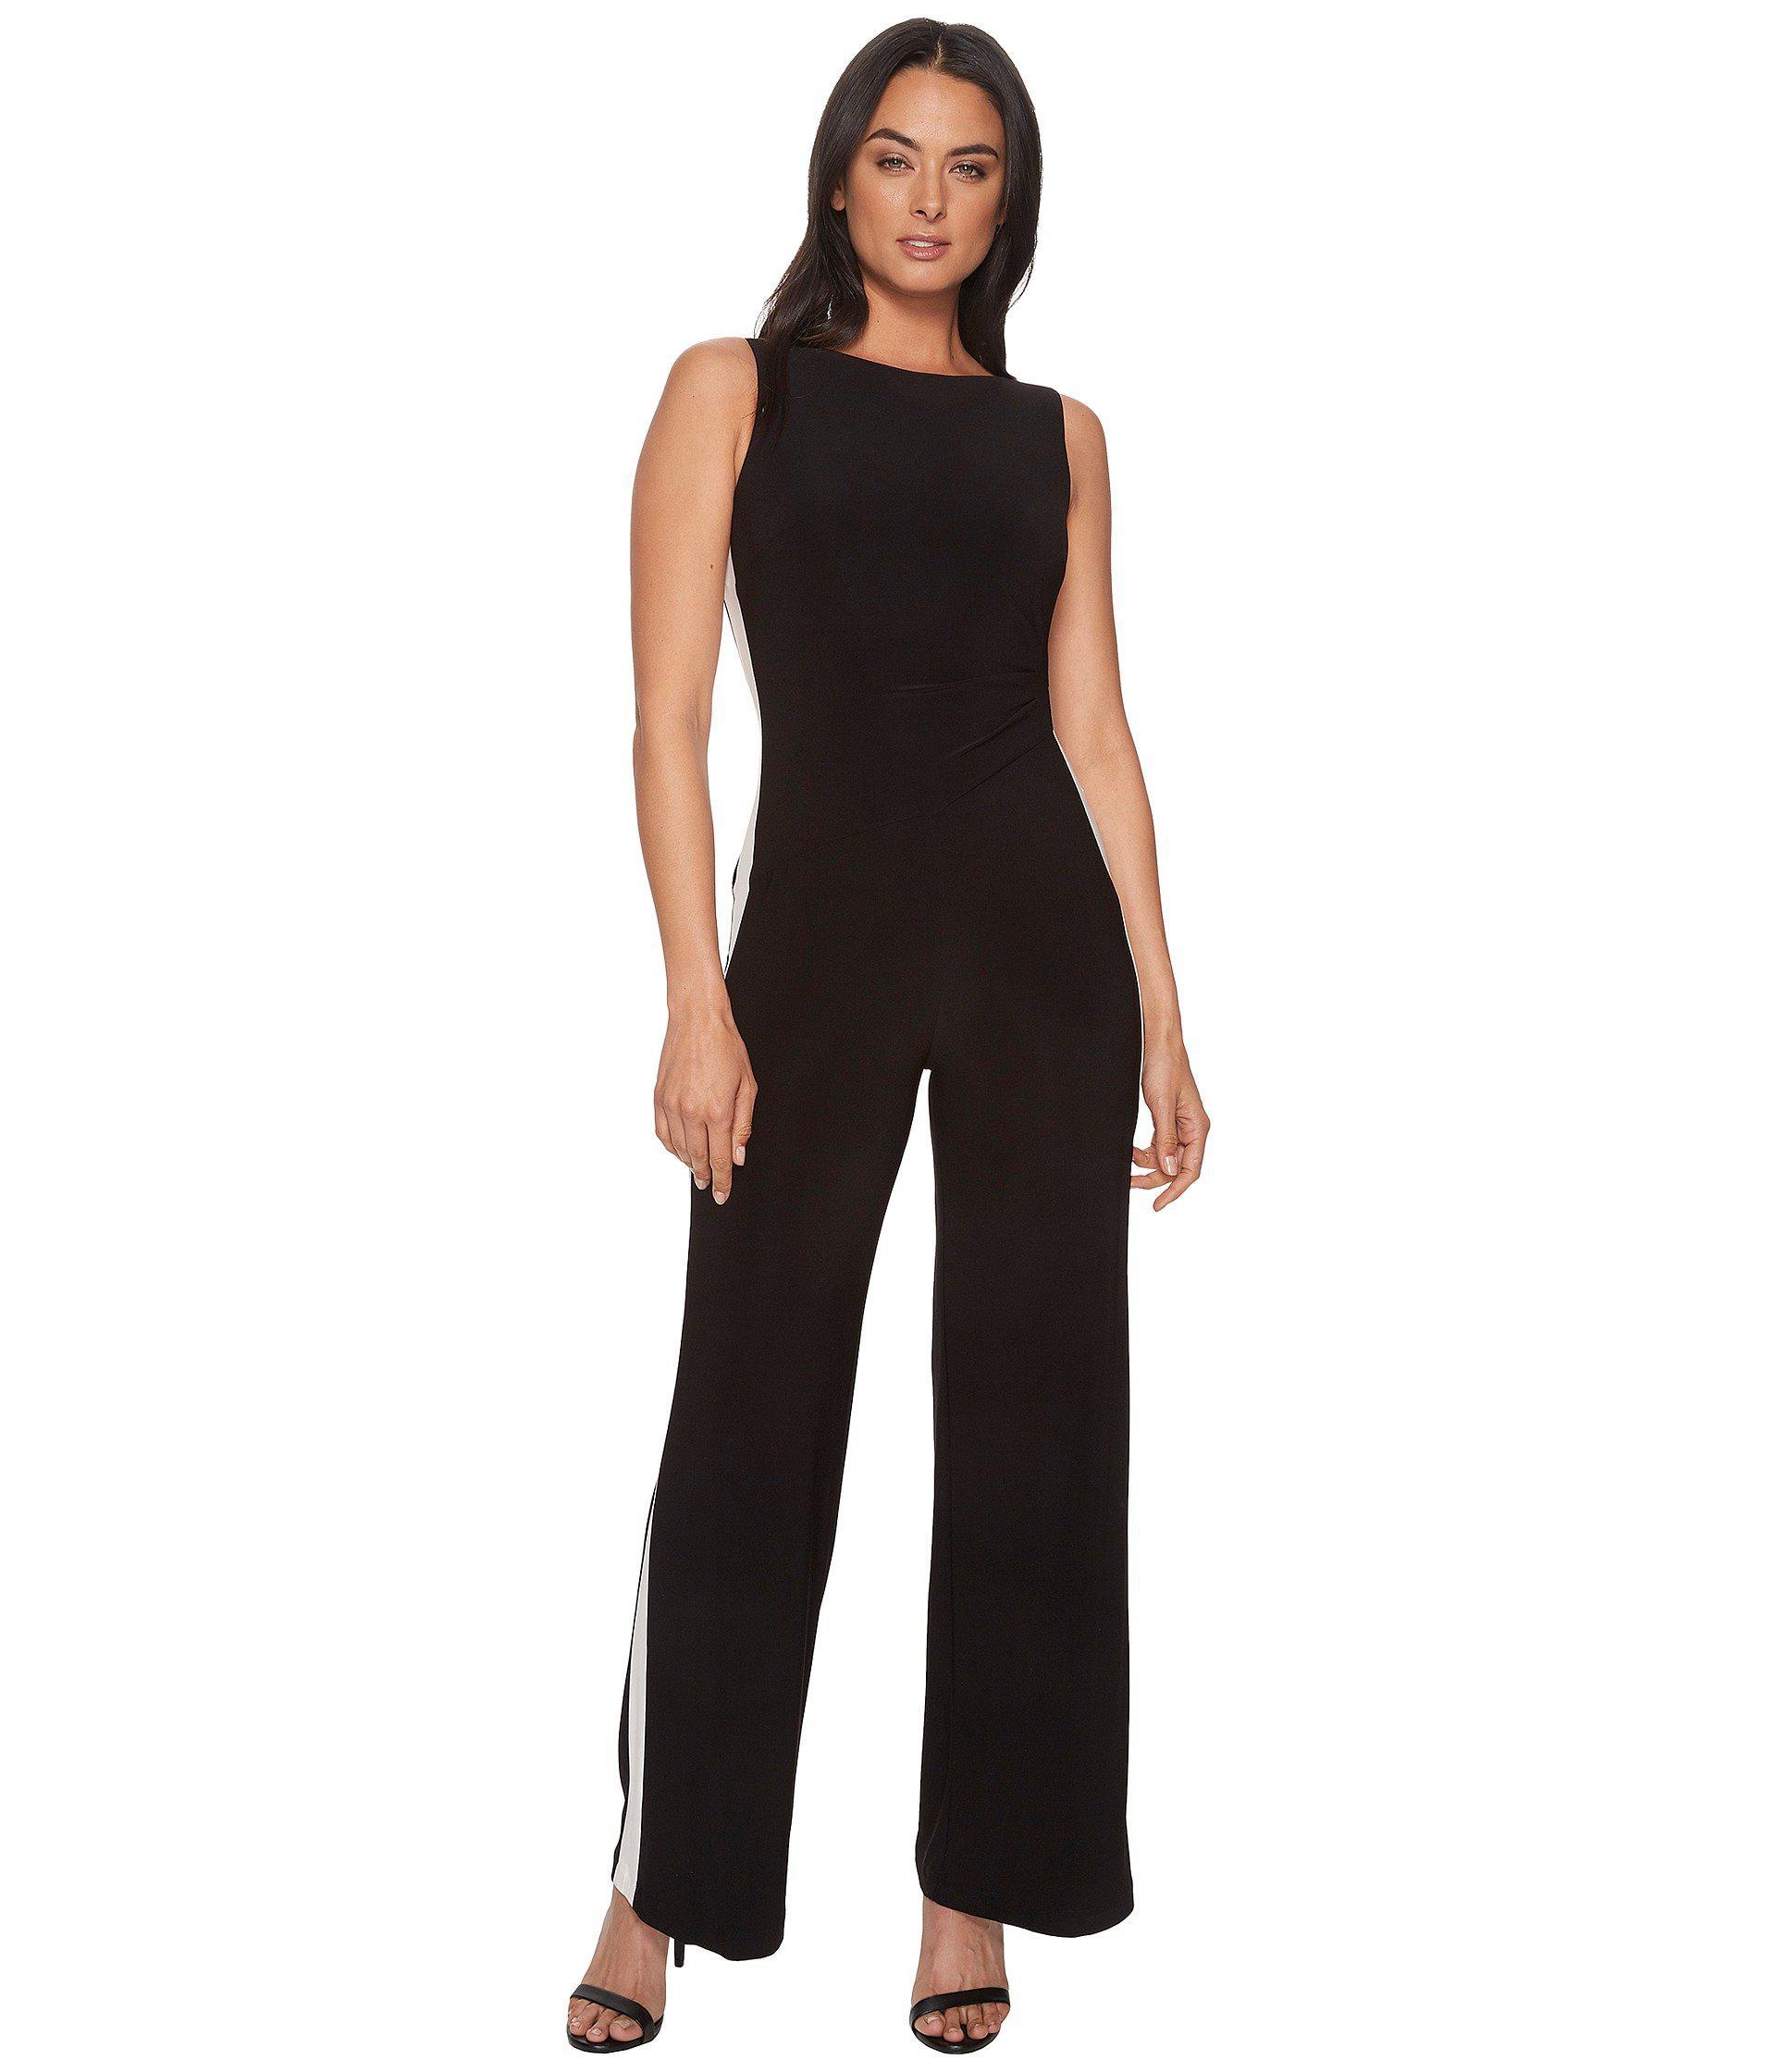 f640e8fc917 Lyst - Lauren by Ralph Lauren Shah Two-tone Matte Jersey Jumpsuit in ...